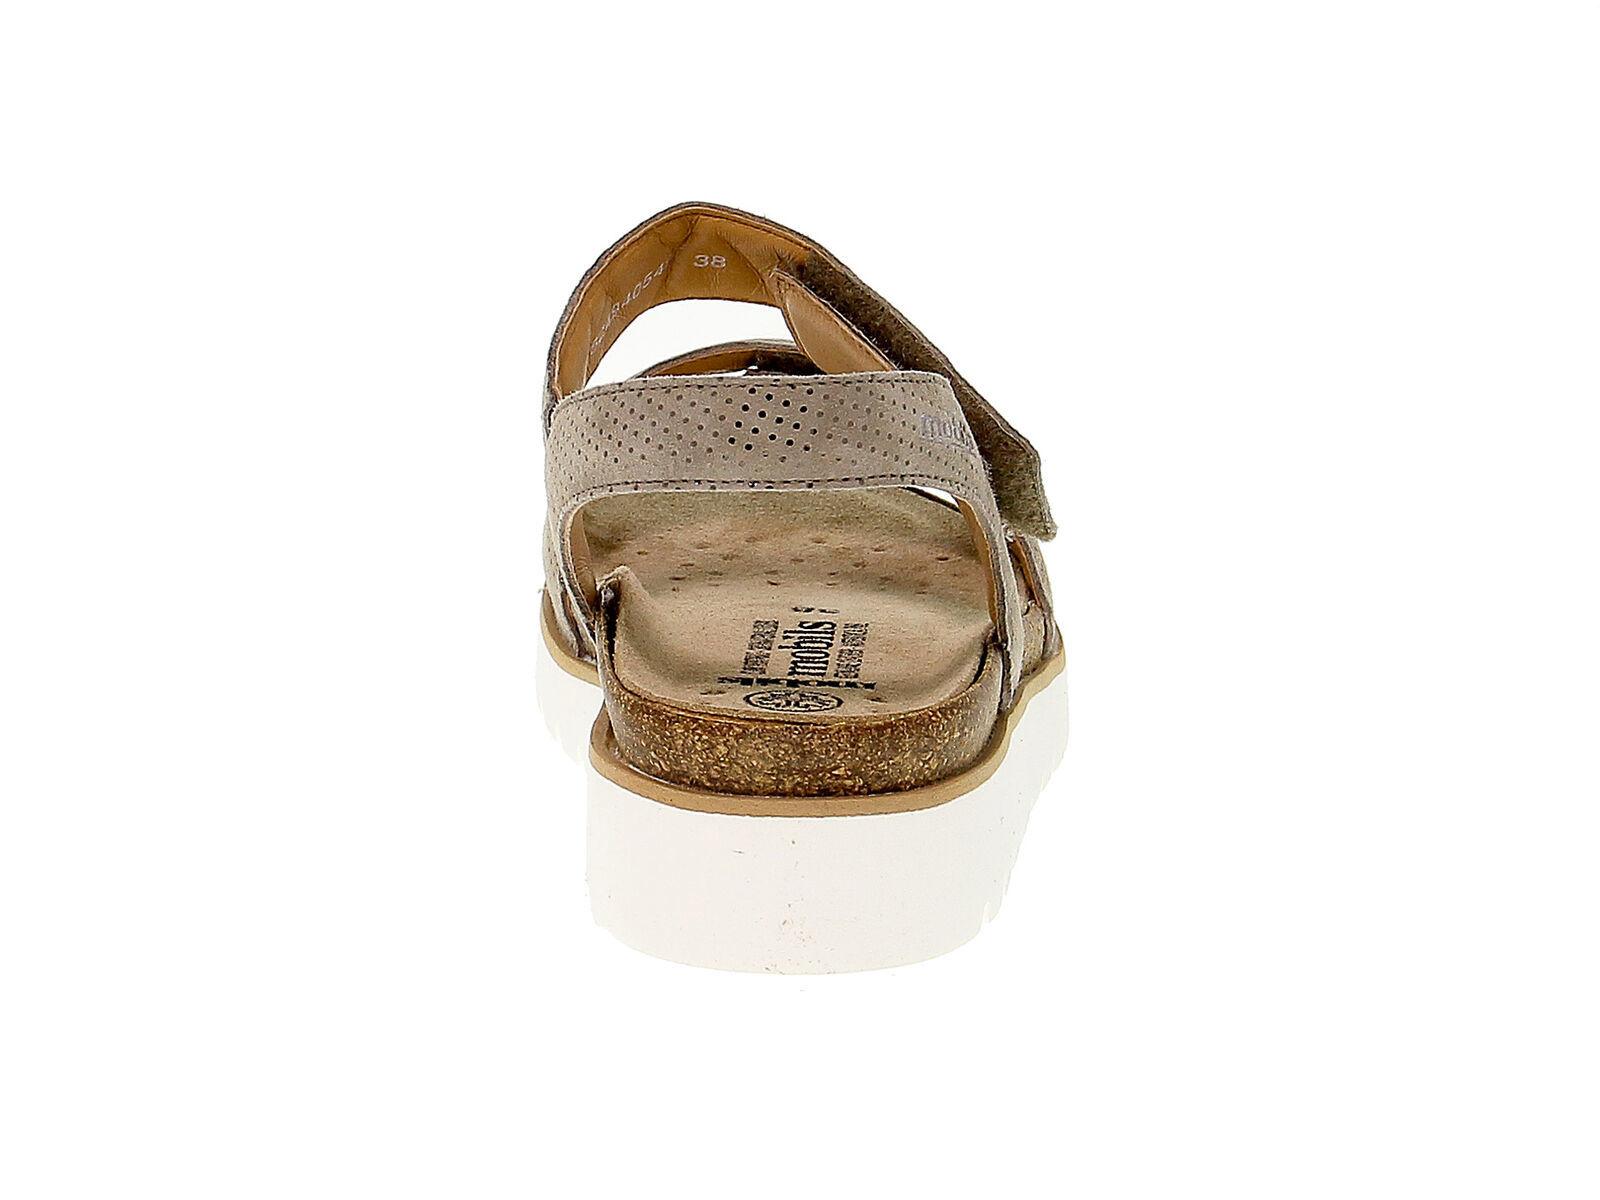 Flache Sandalen MEPHISTO THELMA in cammello nabuk - Schuhe Damen